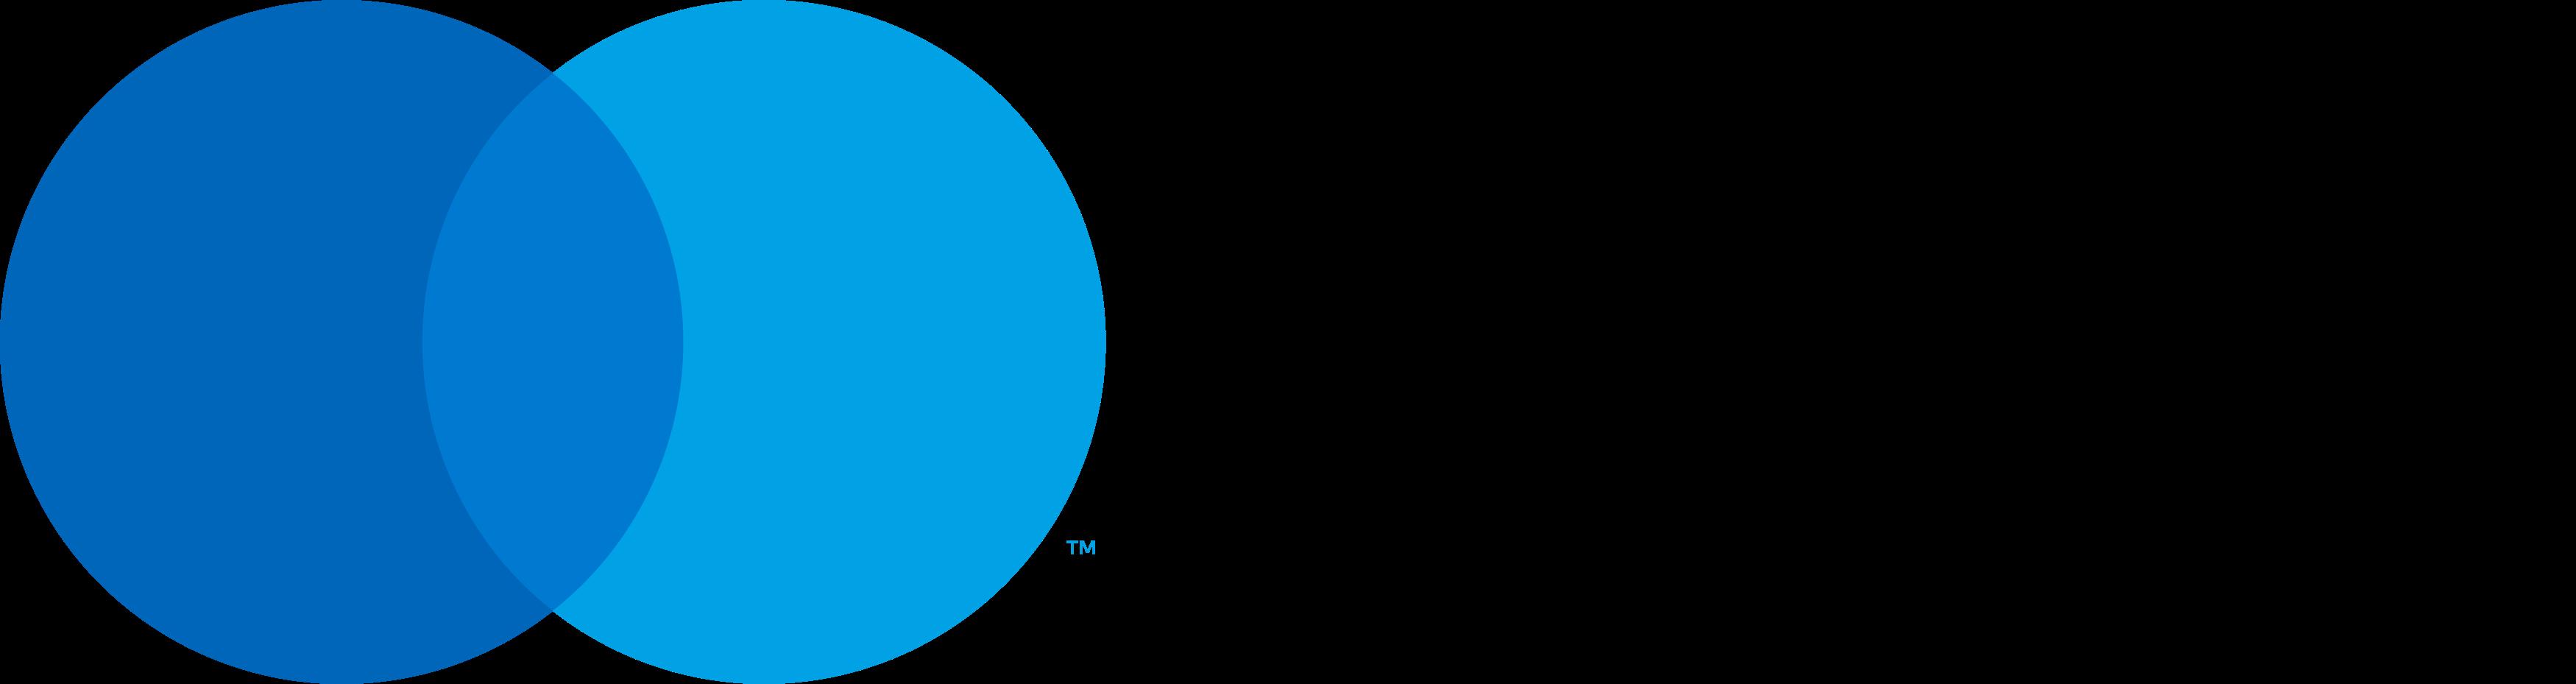 mastercard cirrus logo 1 - Mastercard Cirrus Logo